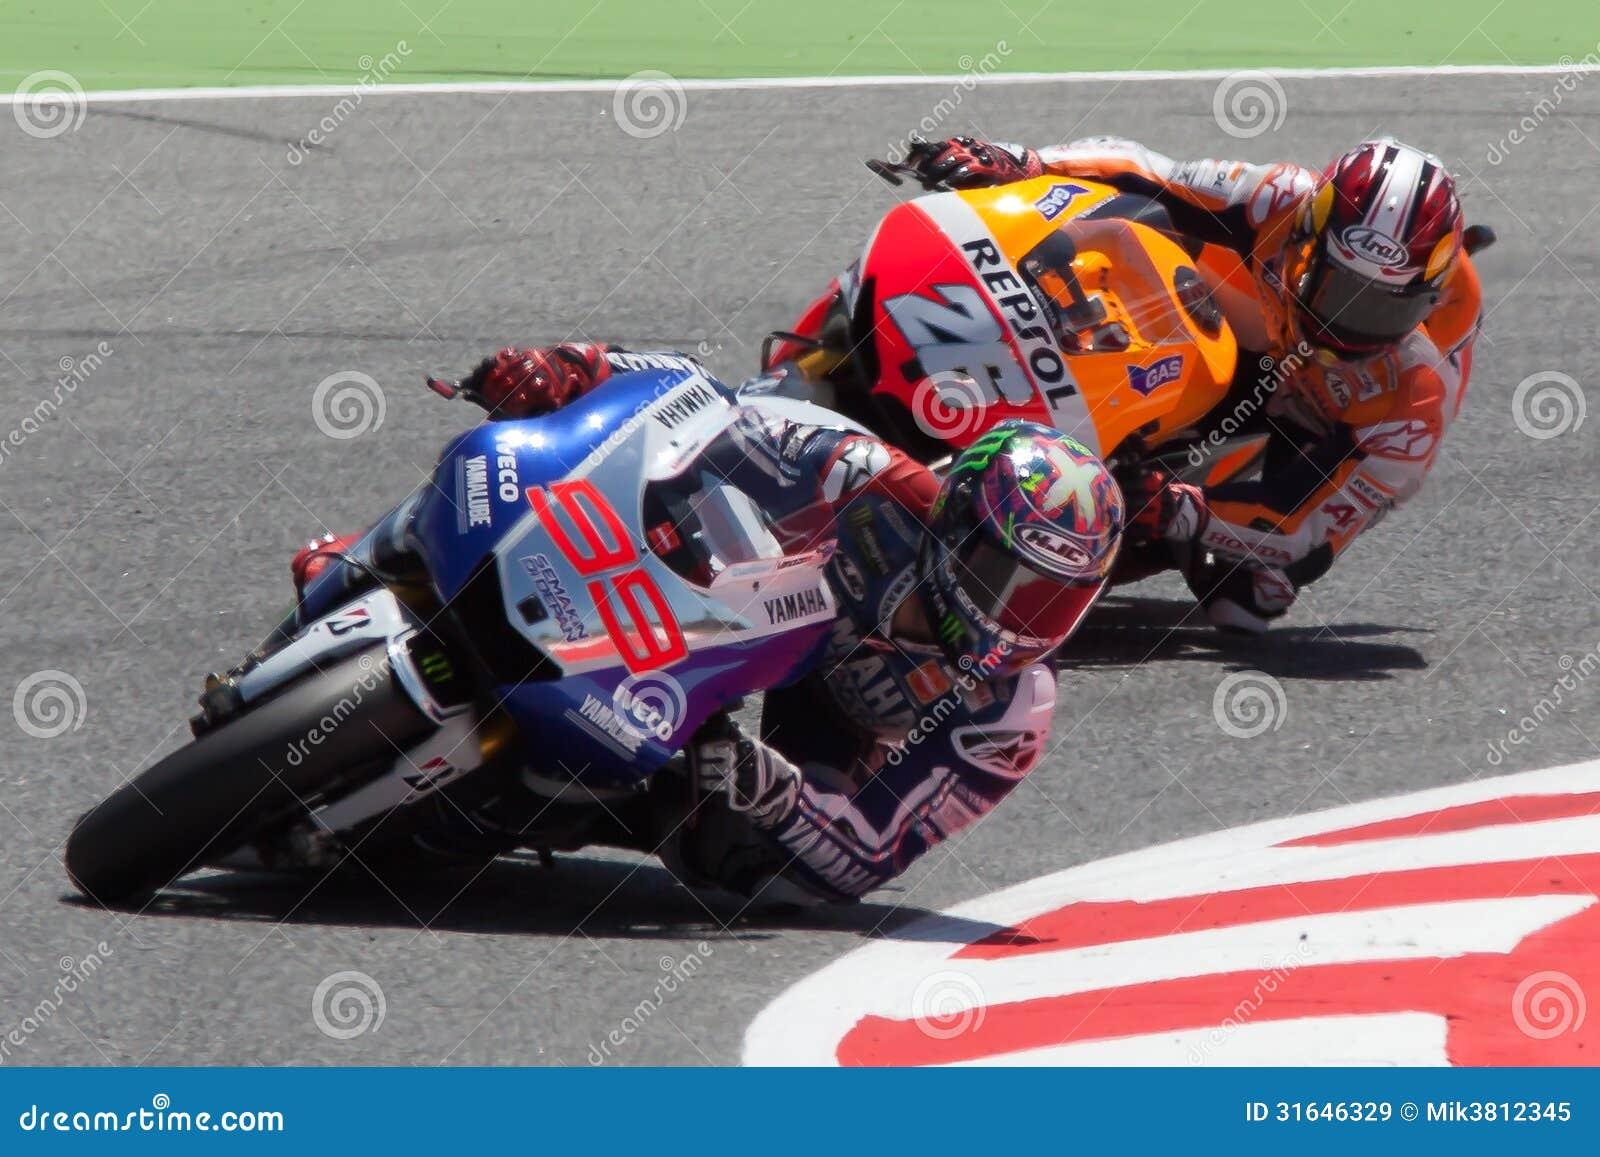 MotoGP. Jorge Lorenzo och Dani Pedrosa